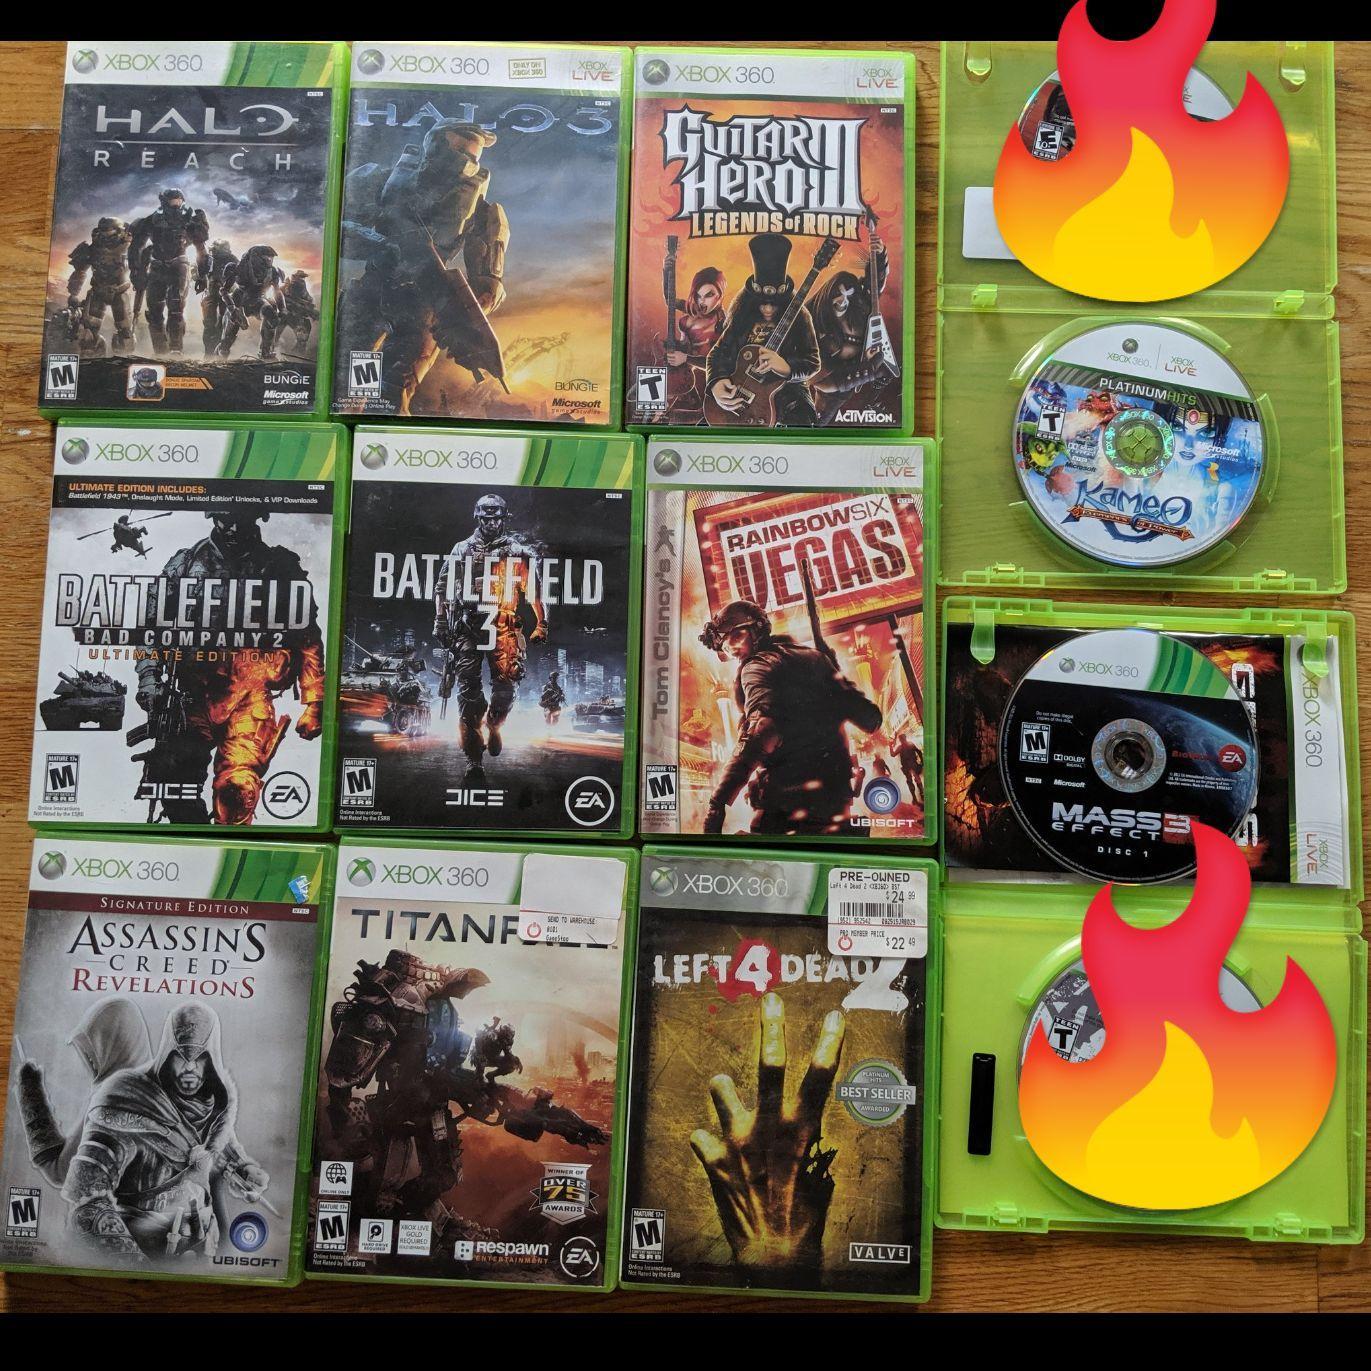 11 Games In Total Halo Reach Halo 3 Guitar Hero 3 Kameo Mass